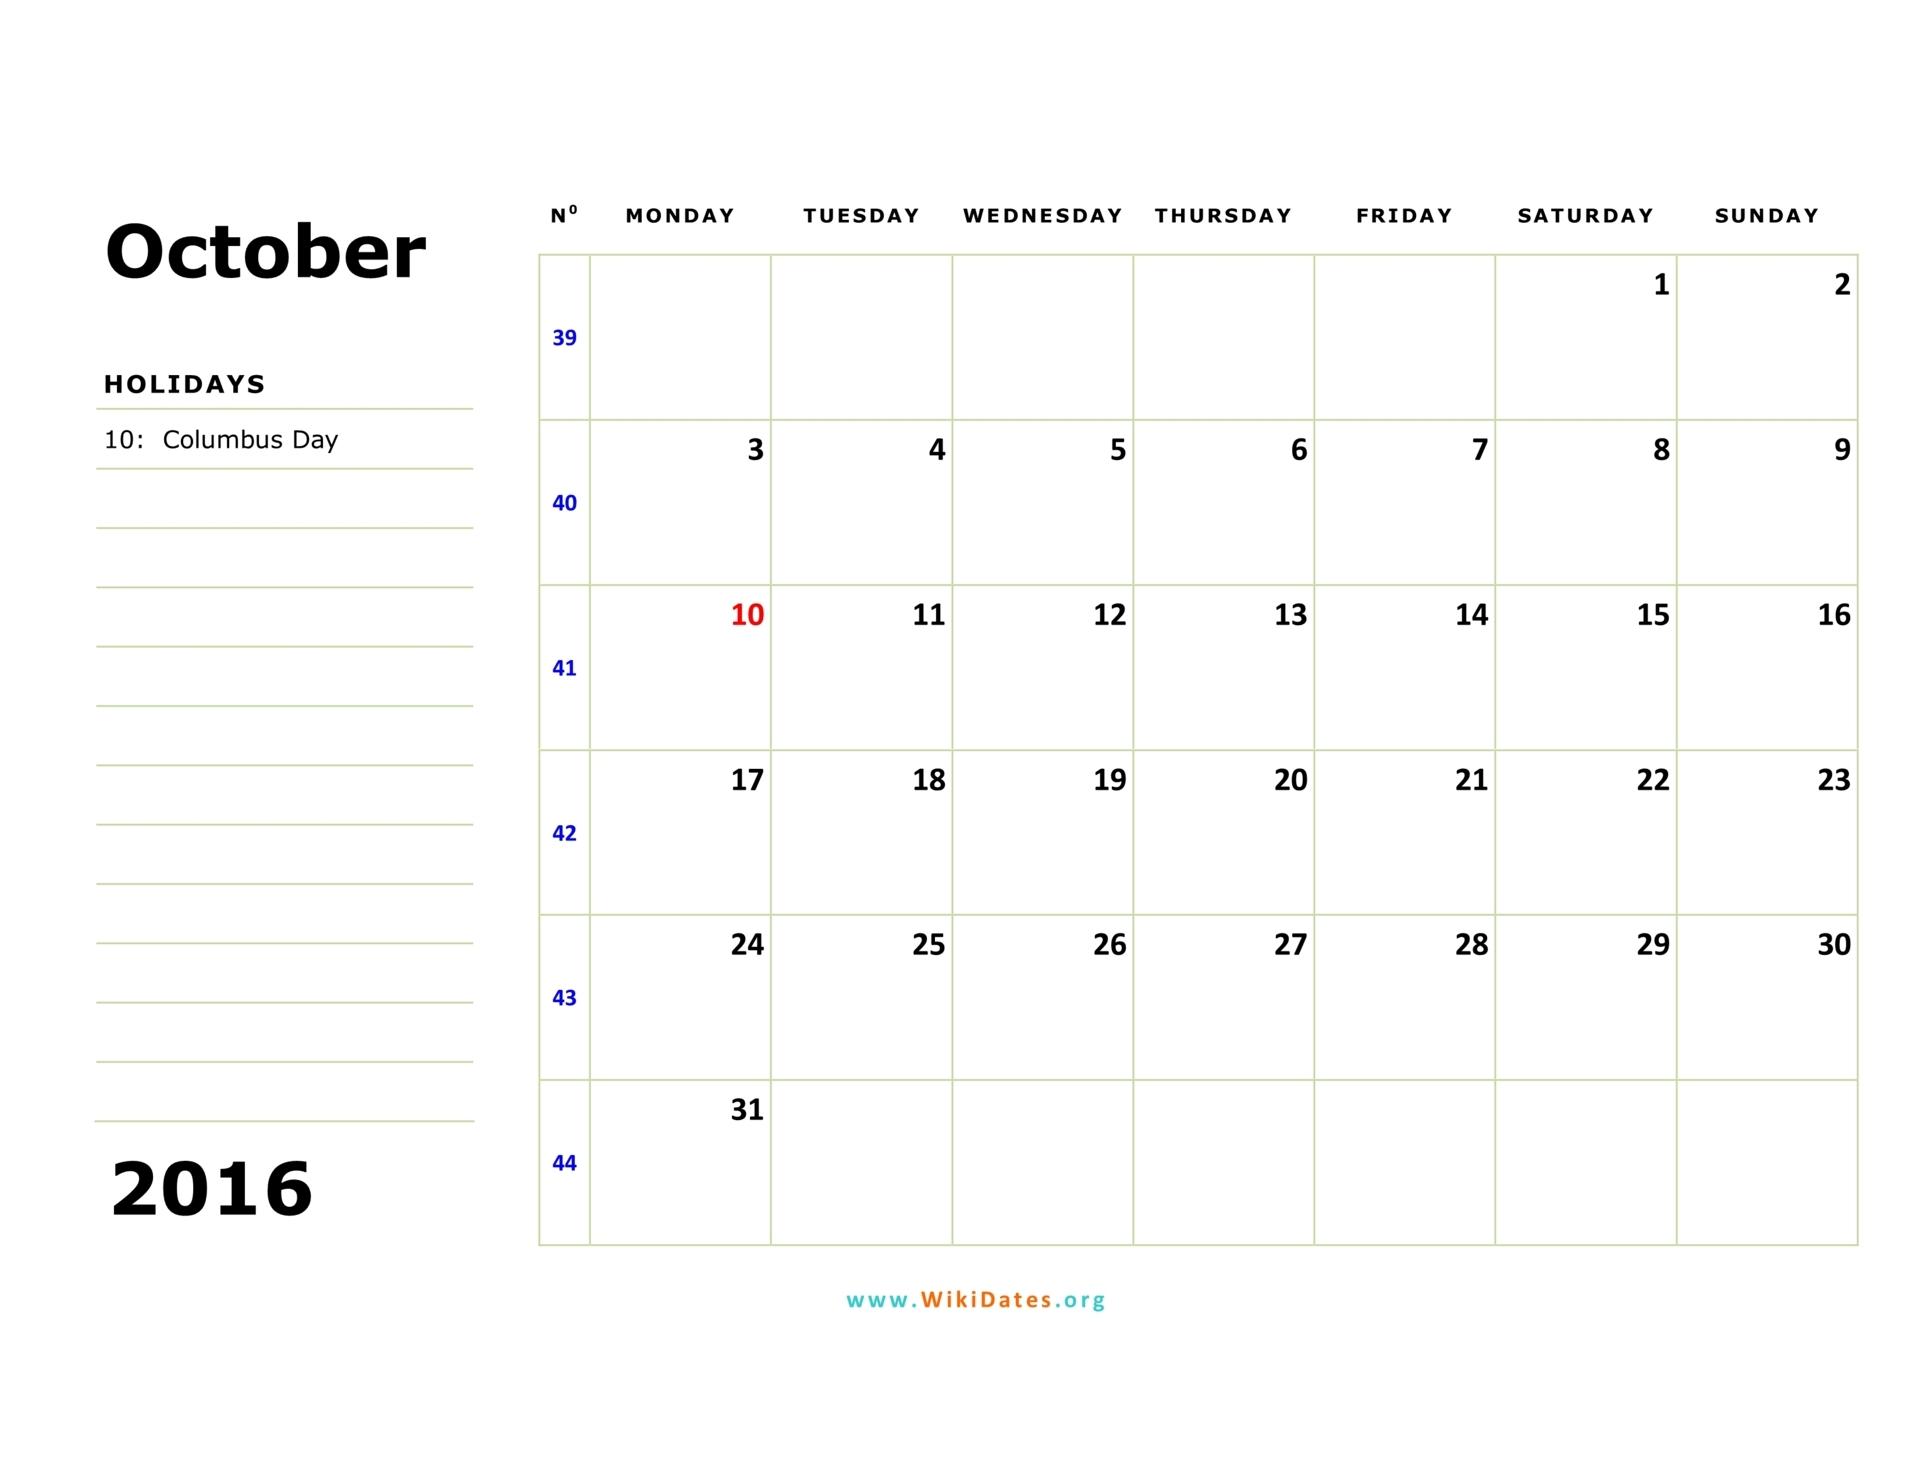 2017 Monthly Calendar - CalendarLabs